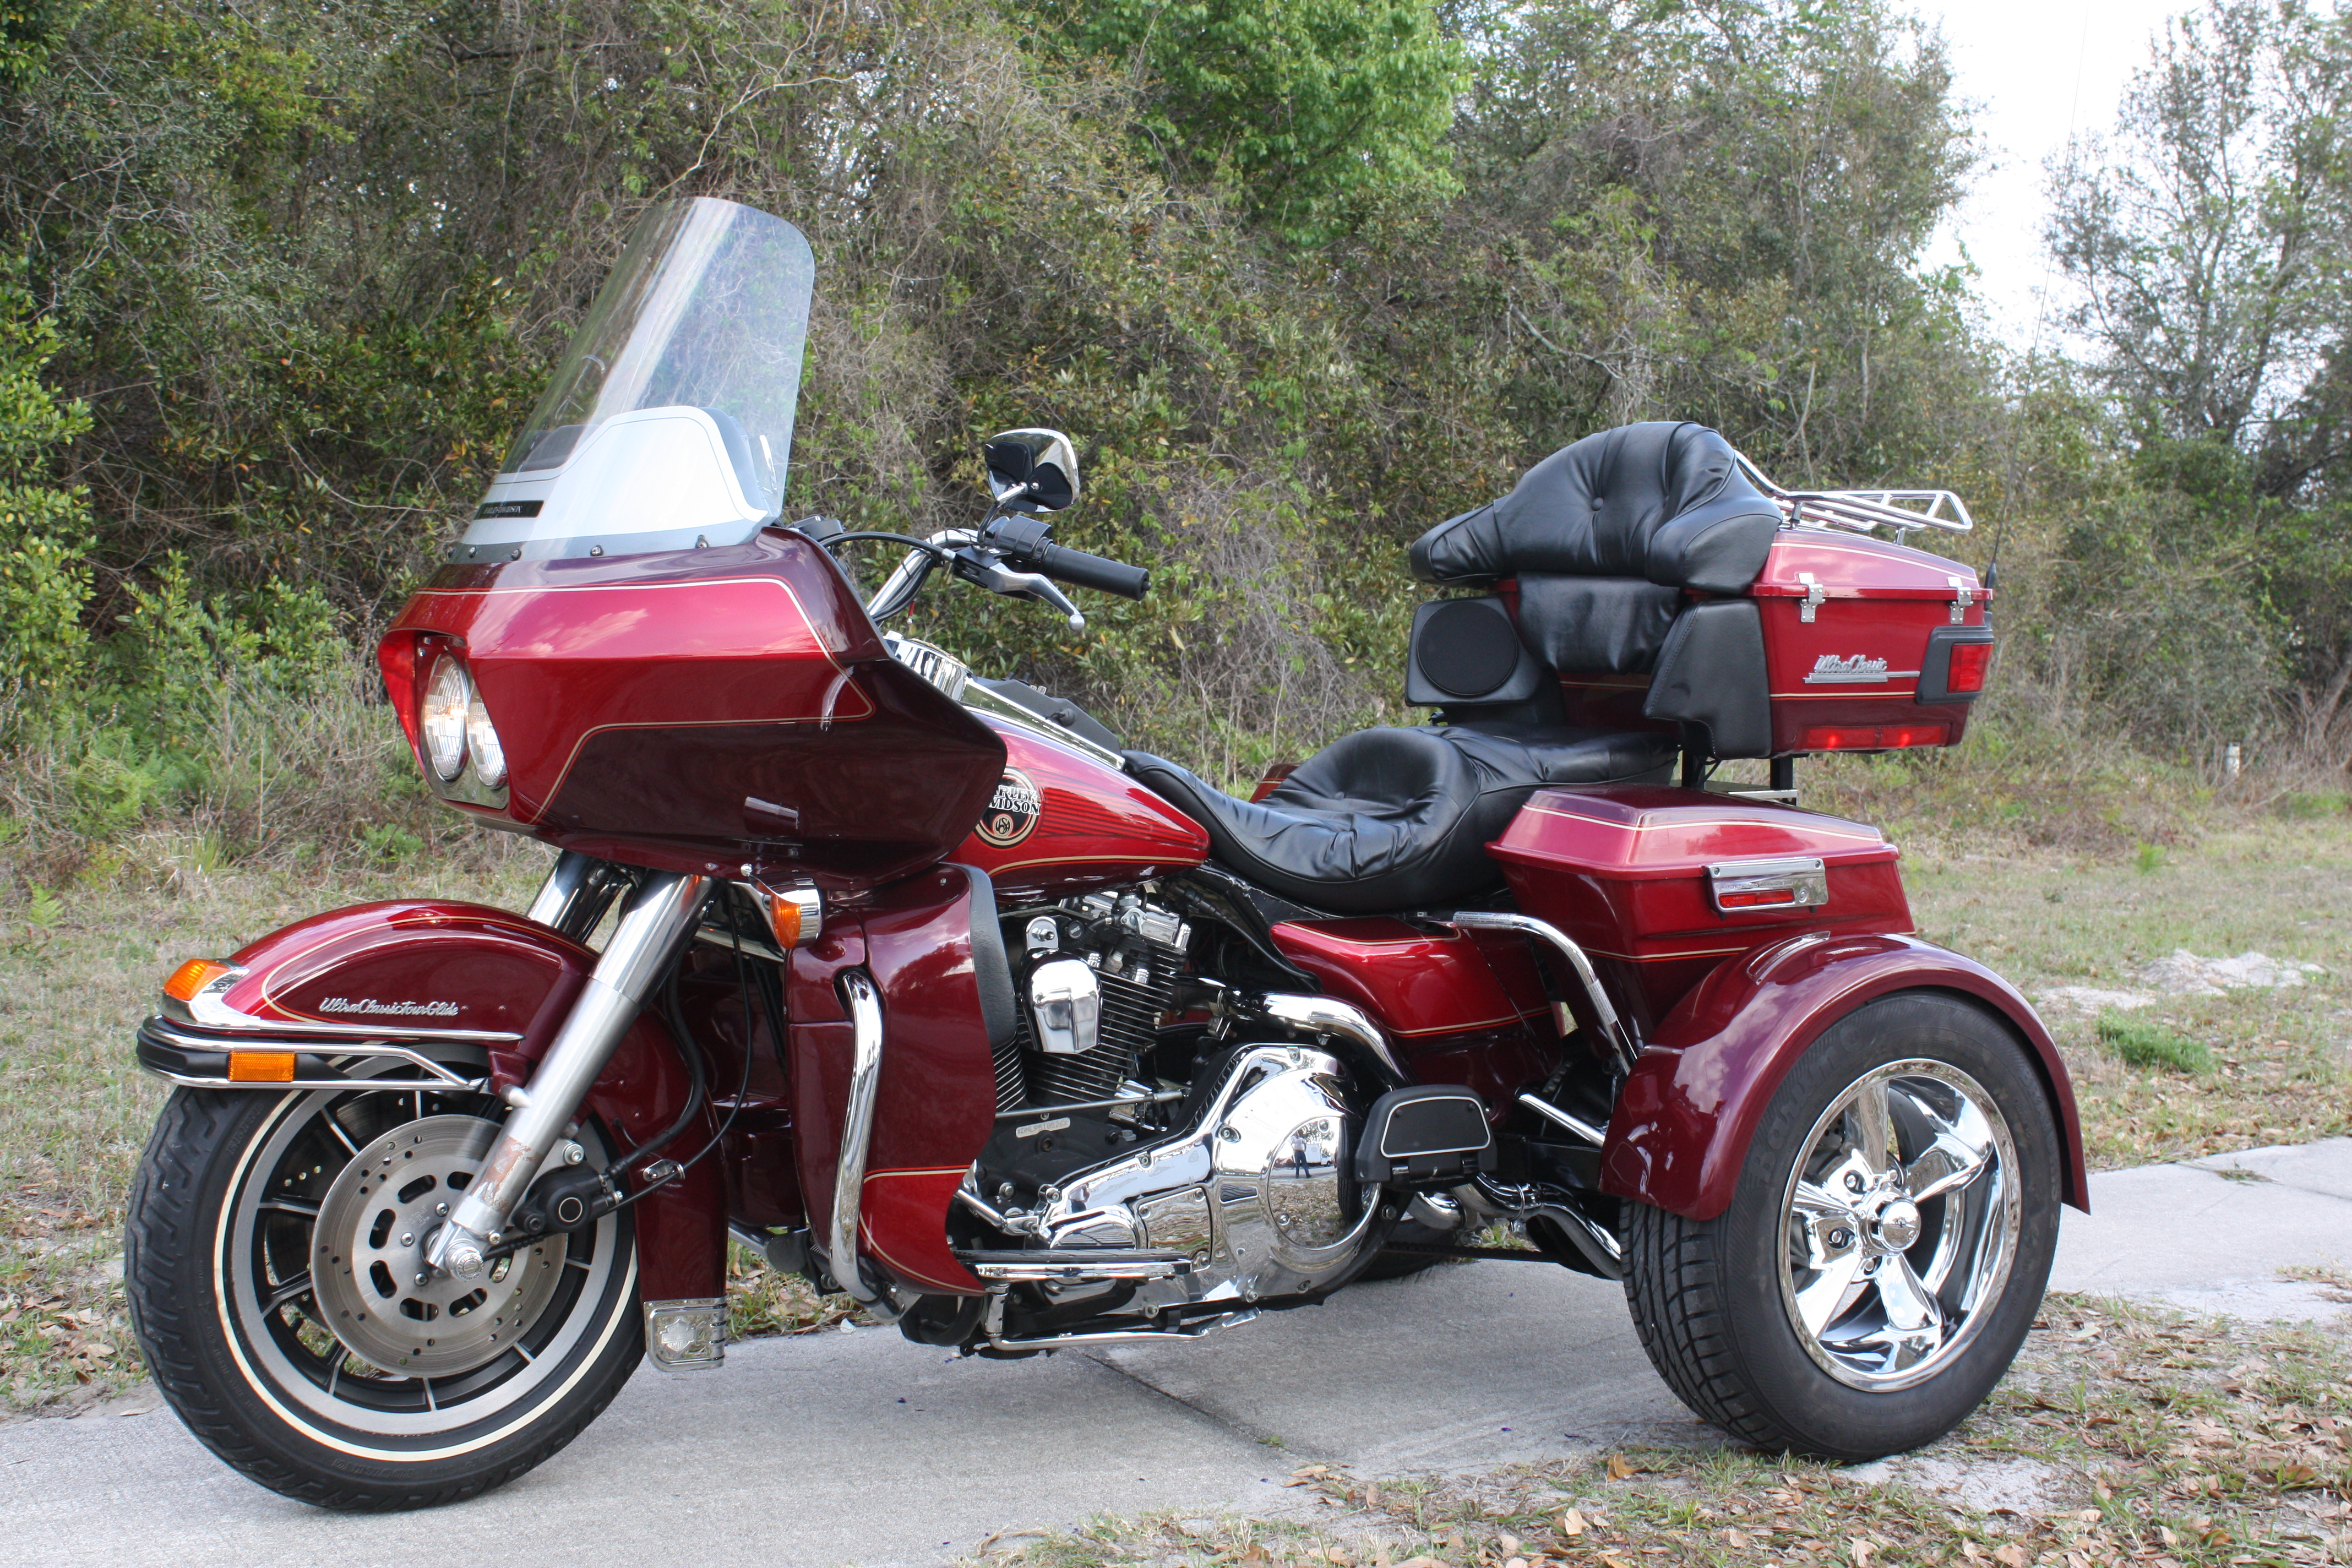 Harley Tour Glide Trike Conversion Kit